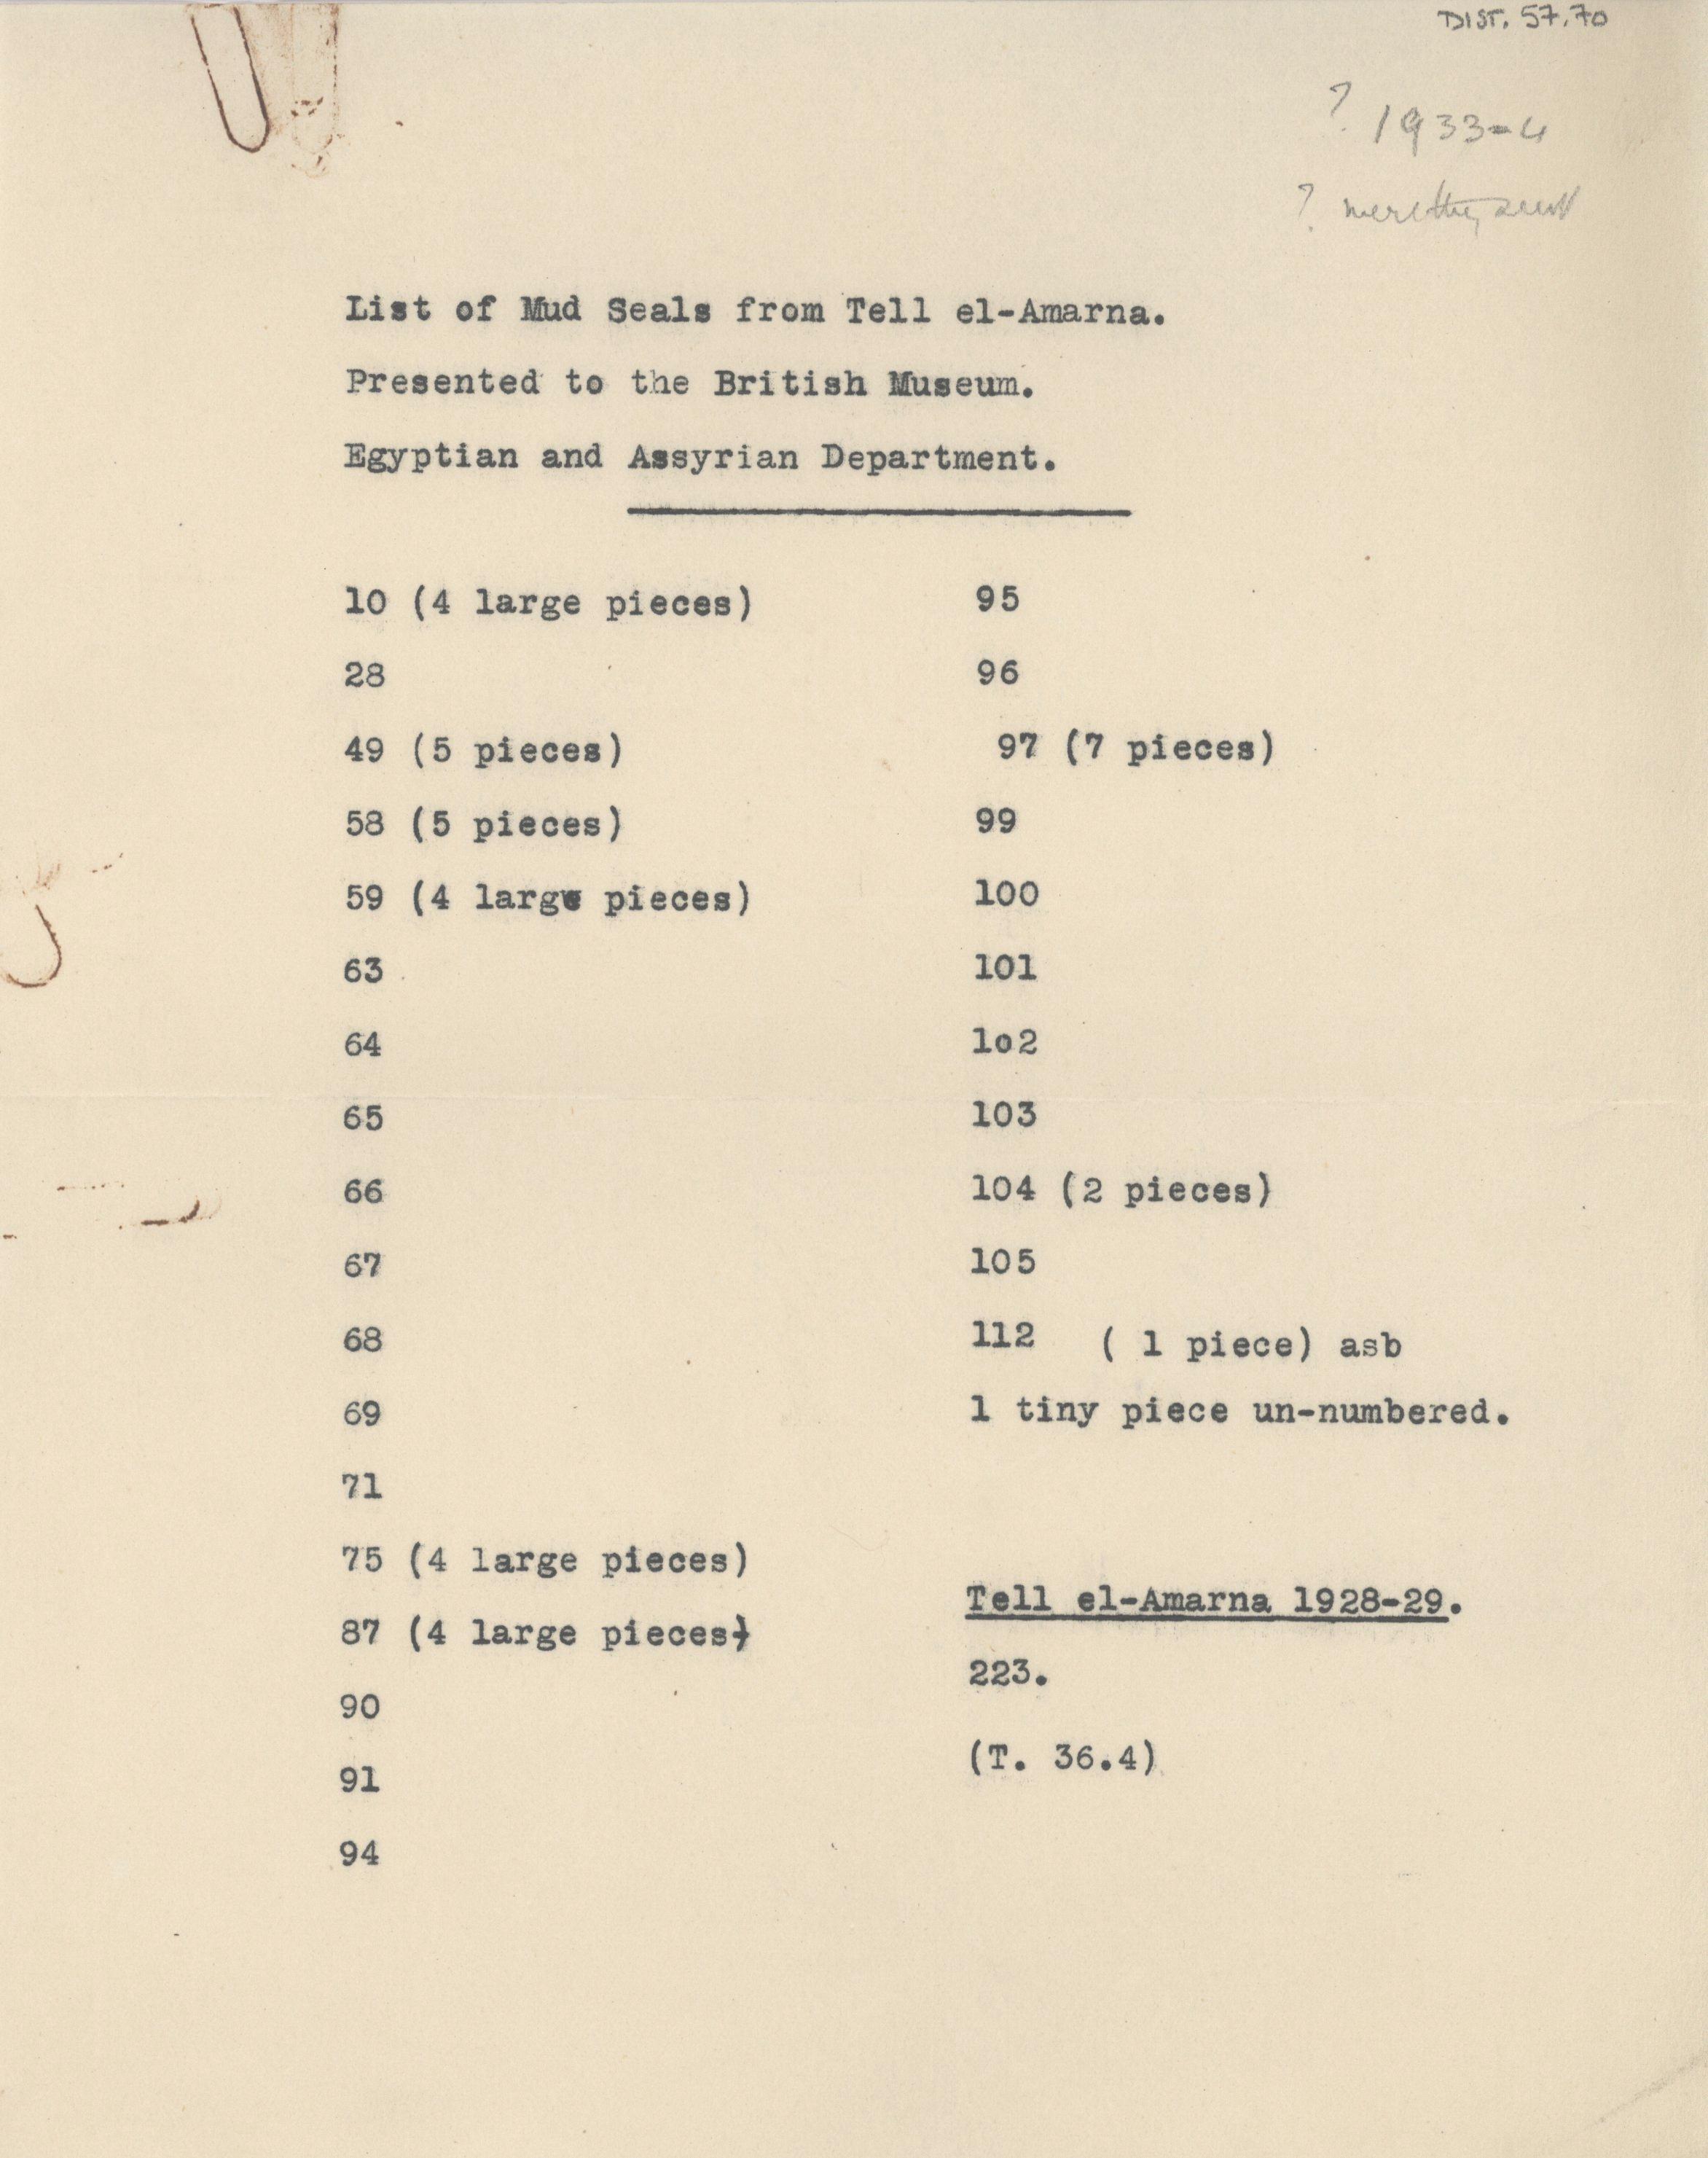 1931-34 el-Amarna DIST.57.70